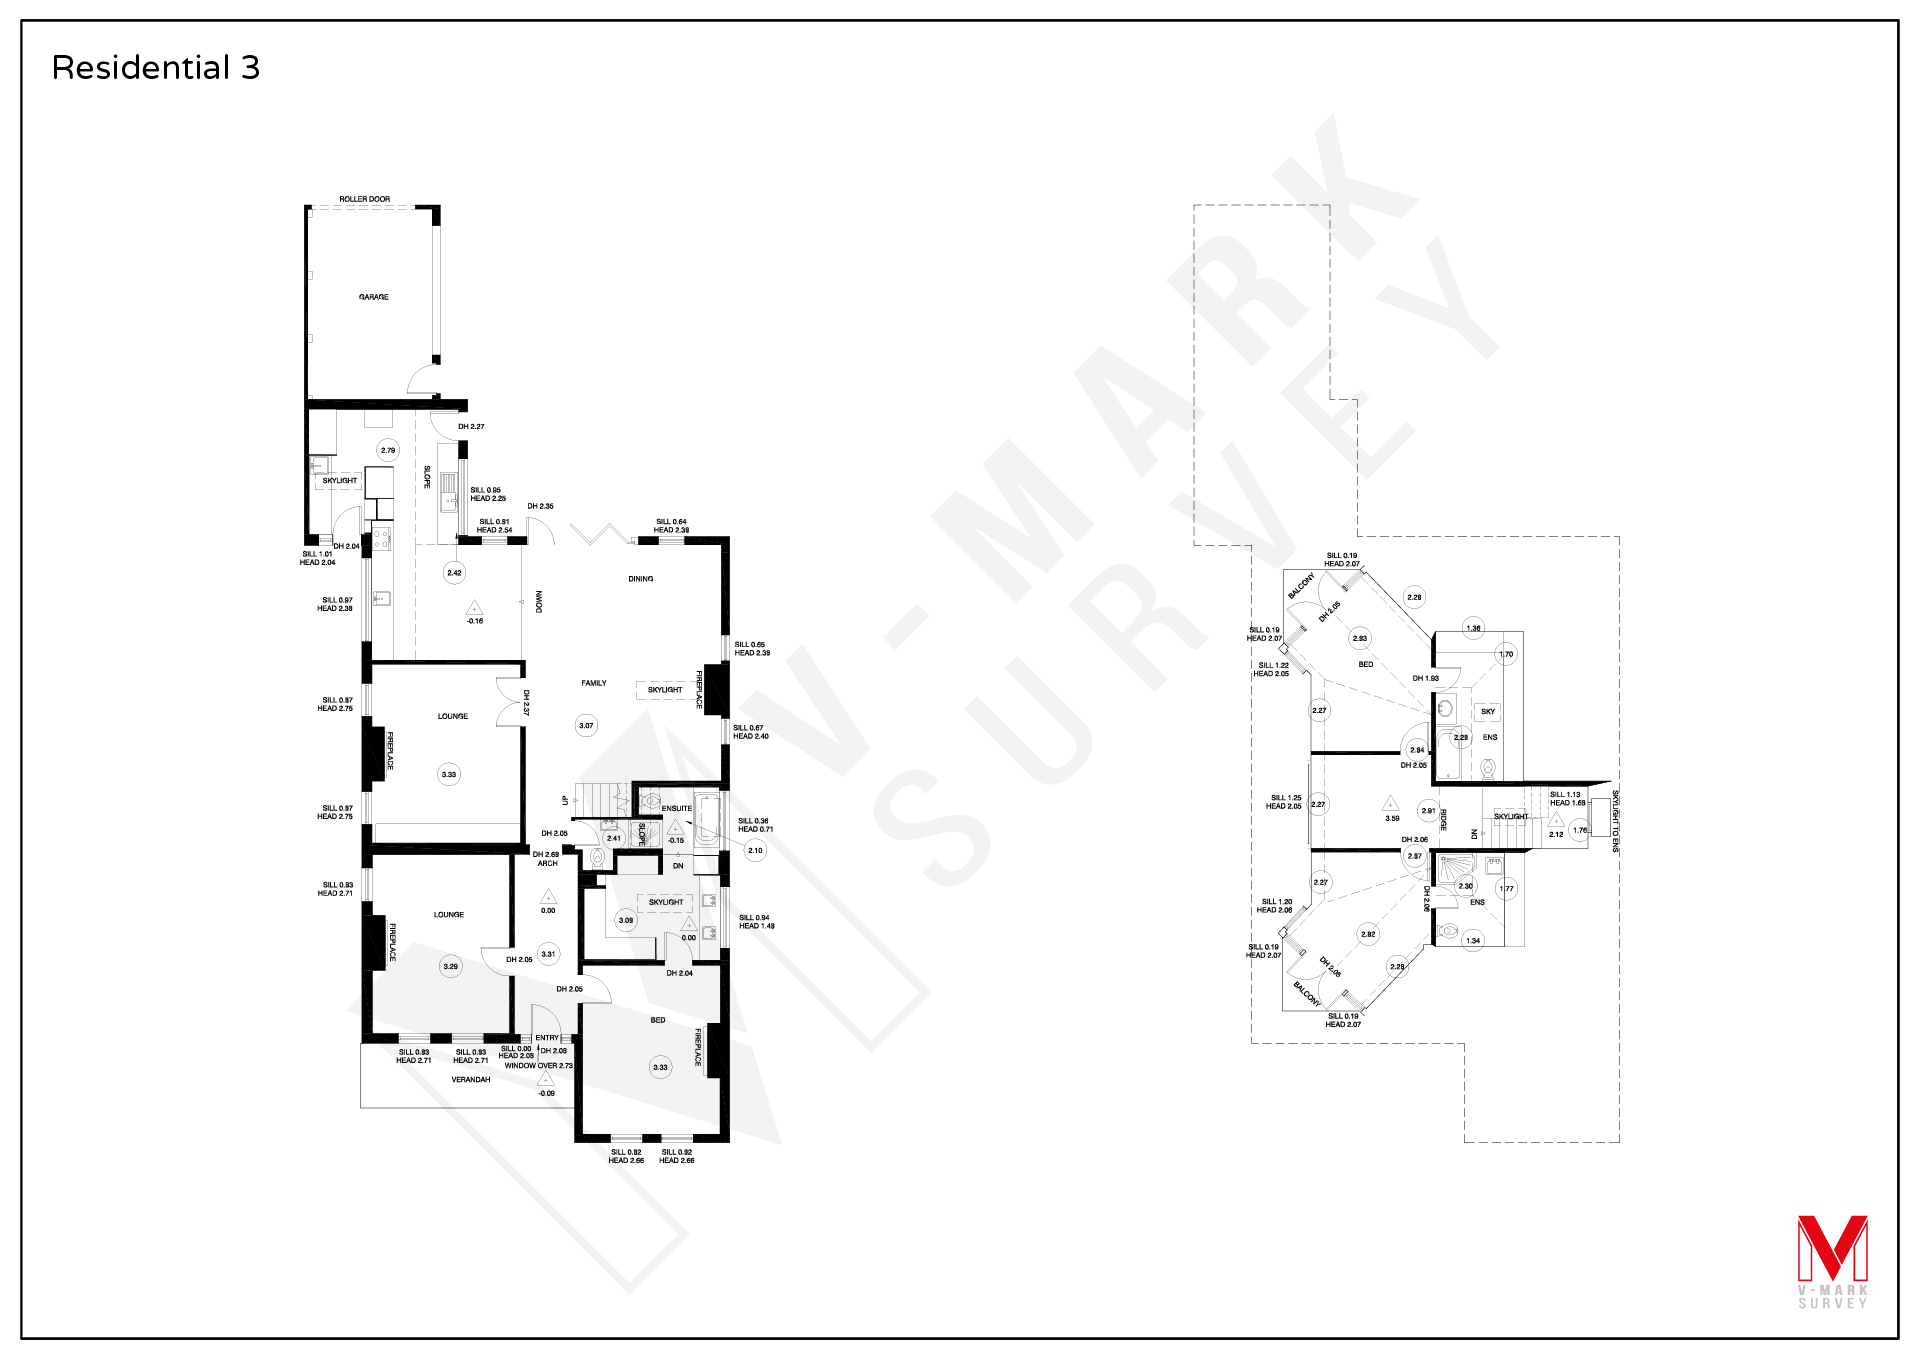 Residential Floor Plans